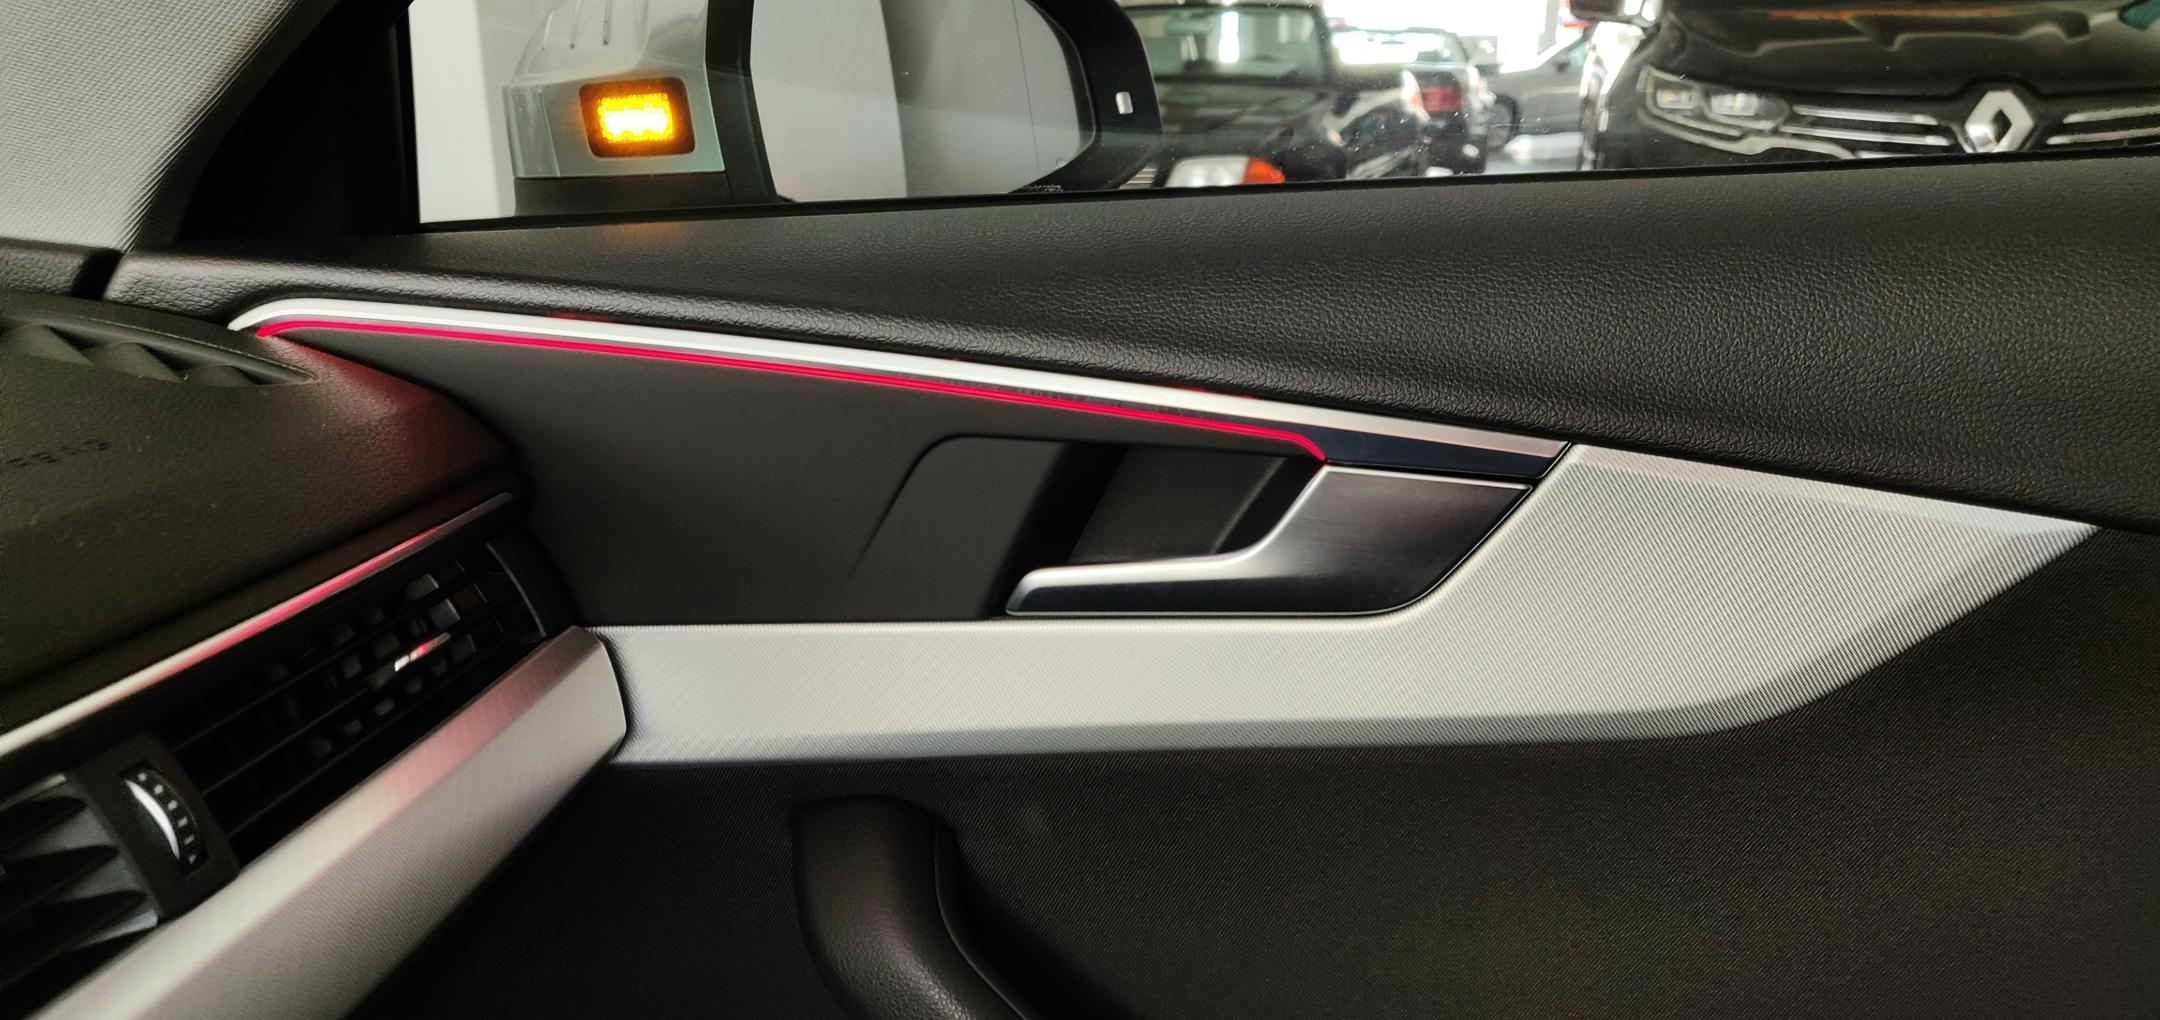 Audi A4 2.0 AVANT | Imagem 8